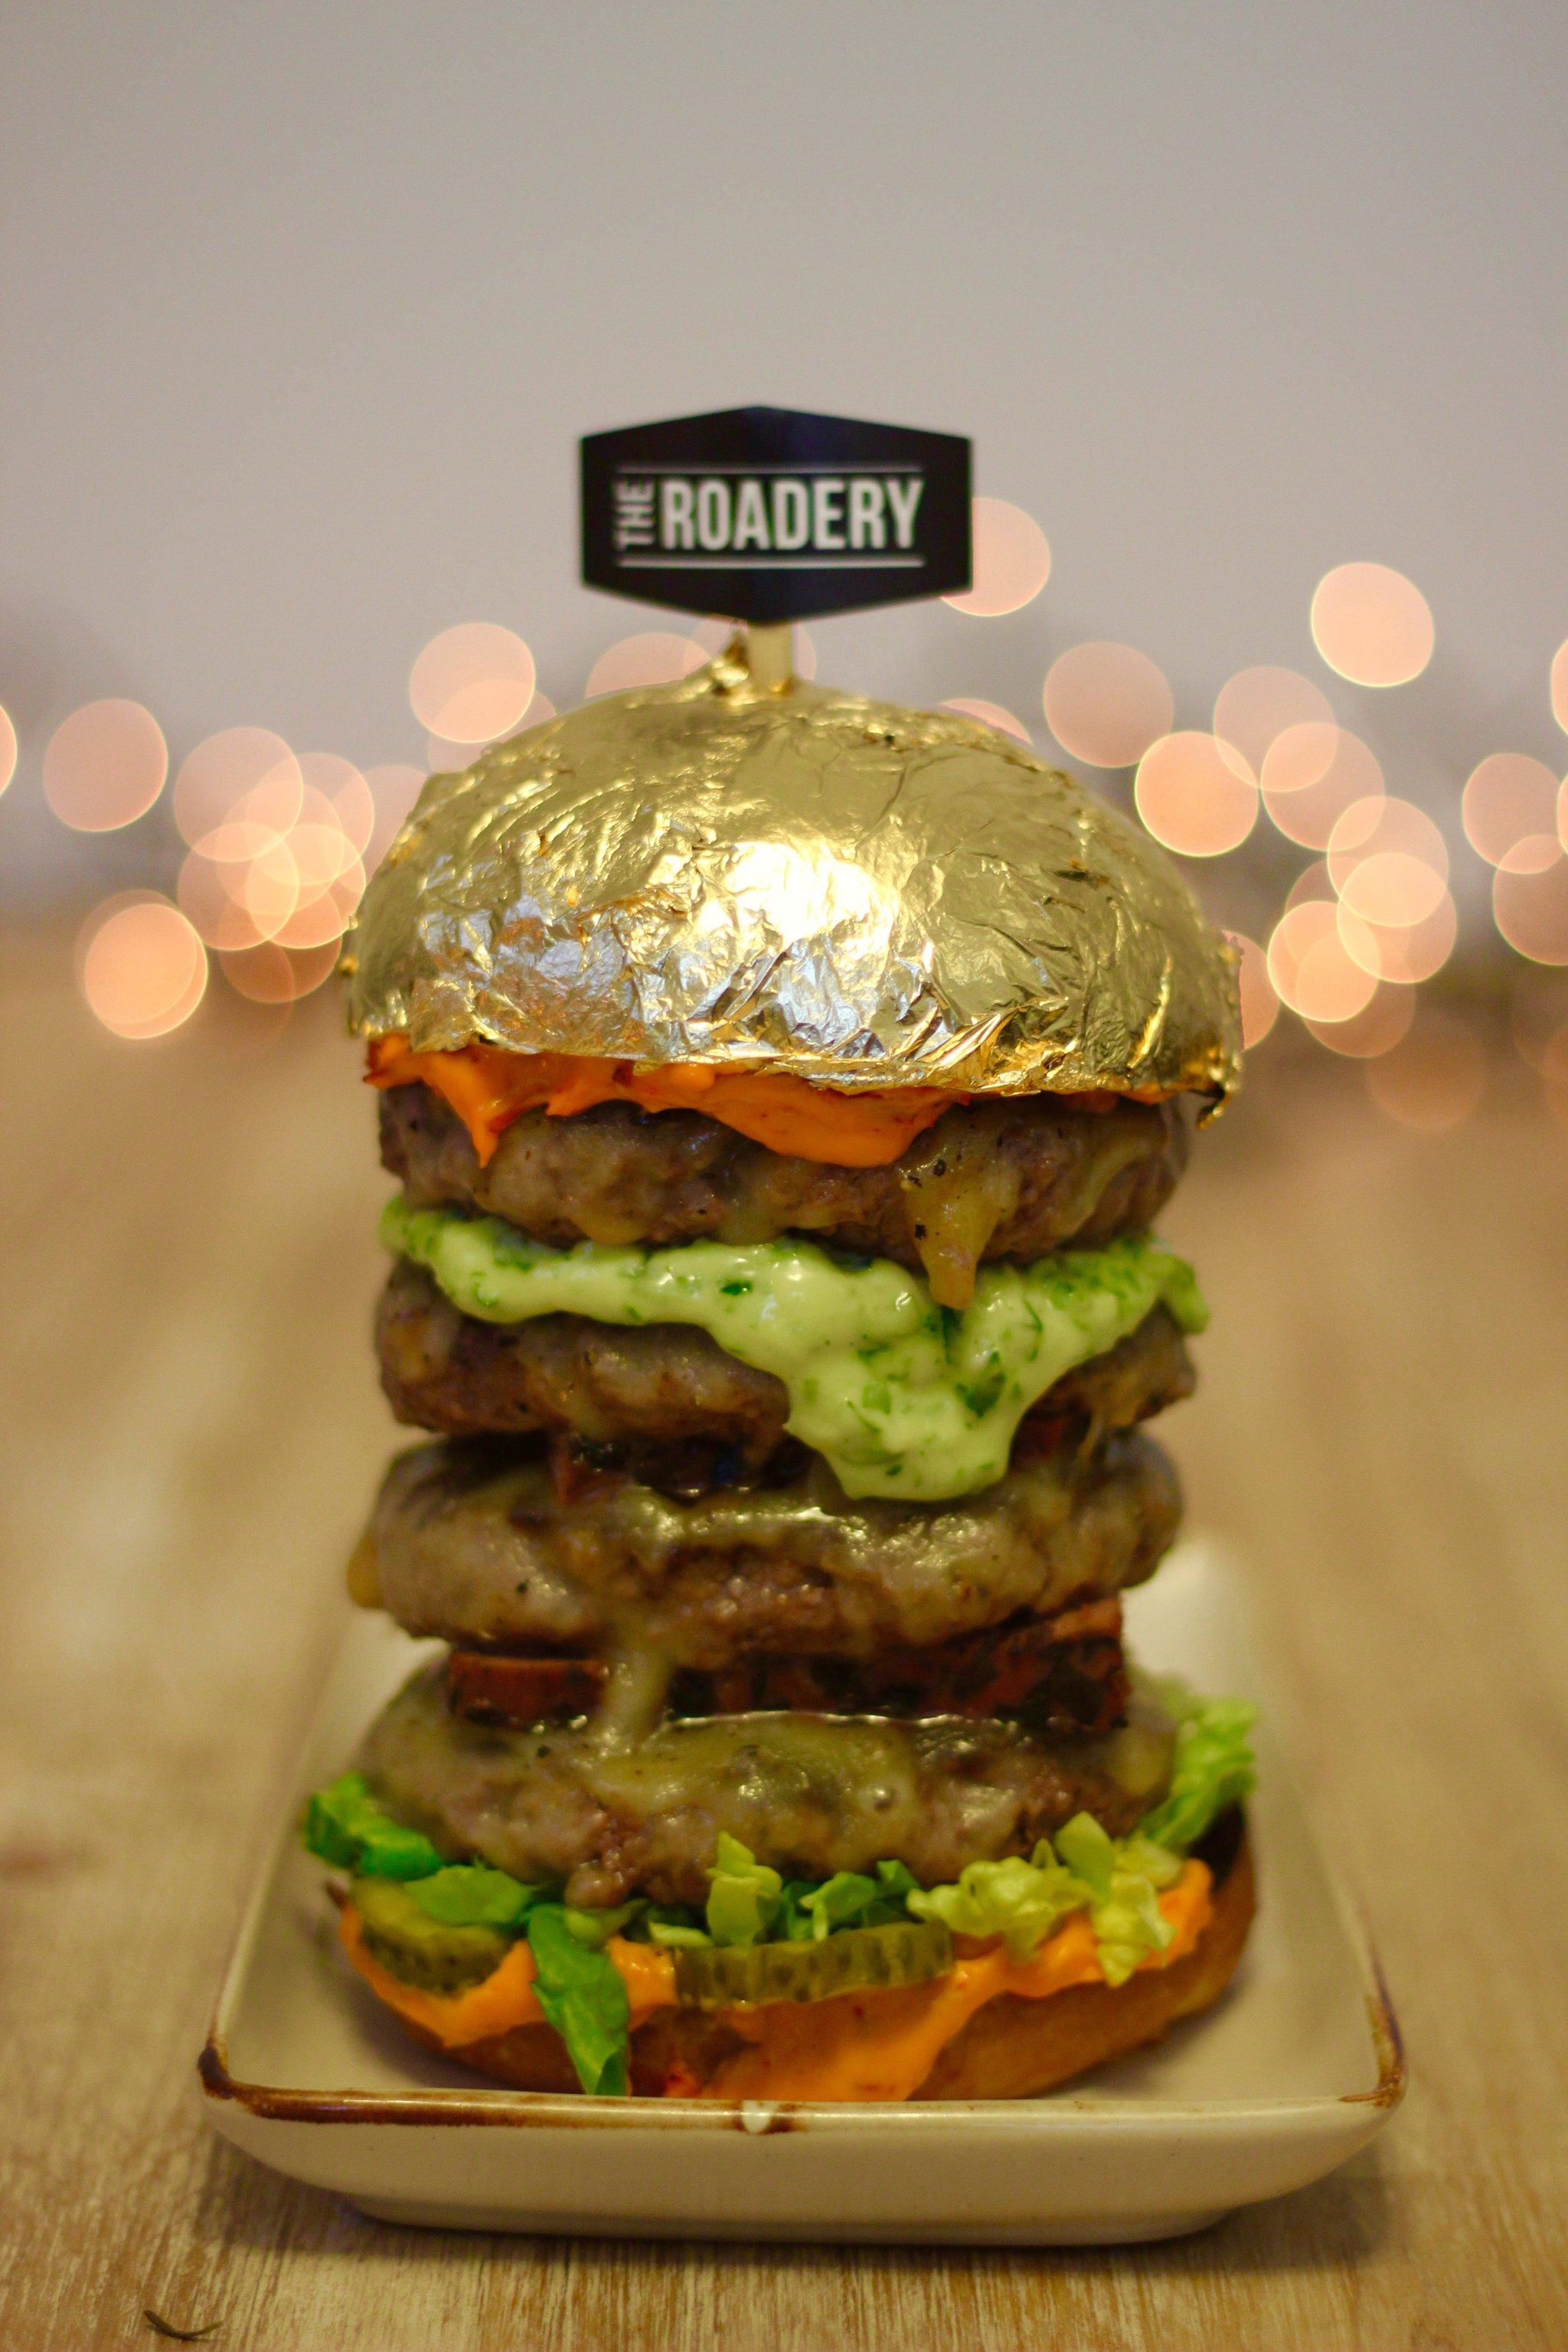 meat dubai 39 s new luxury burger burg khalifa. Black Bedroom Furniture Sets. Home Design Ideas